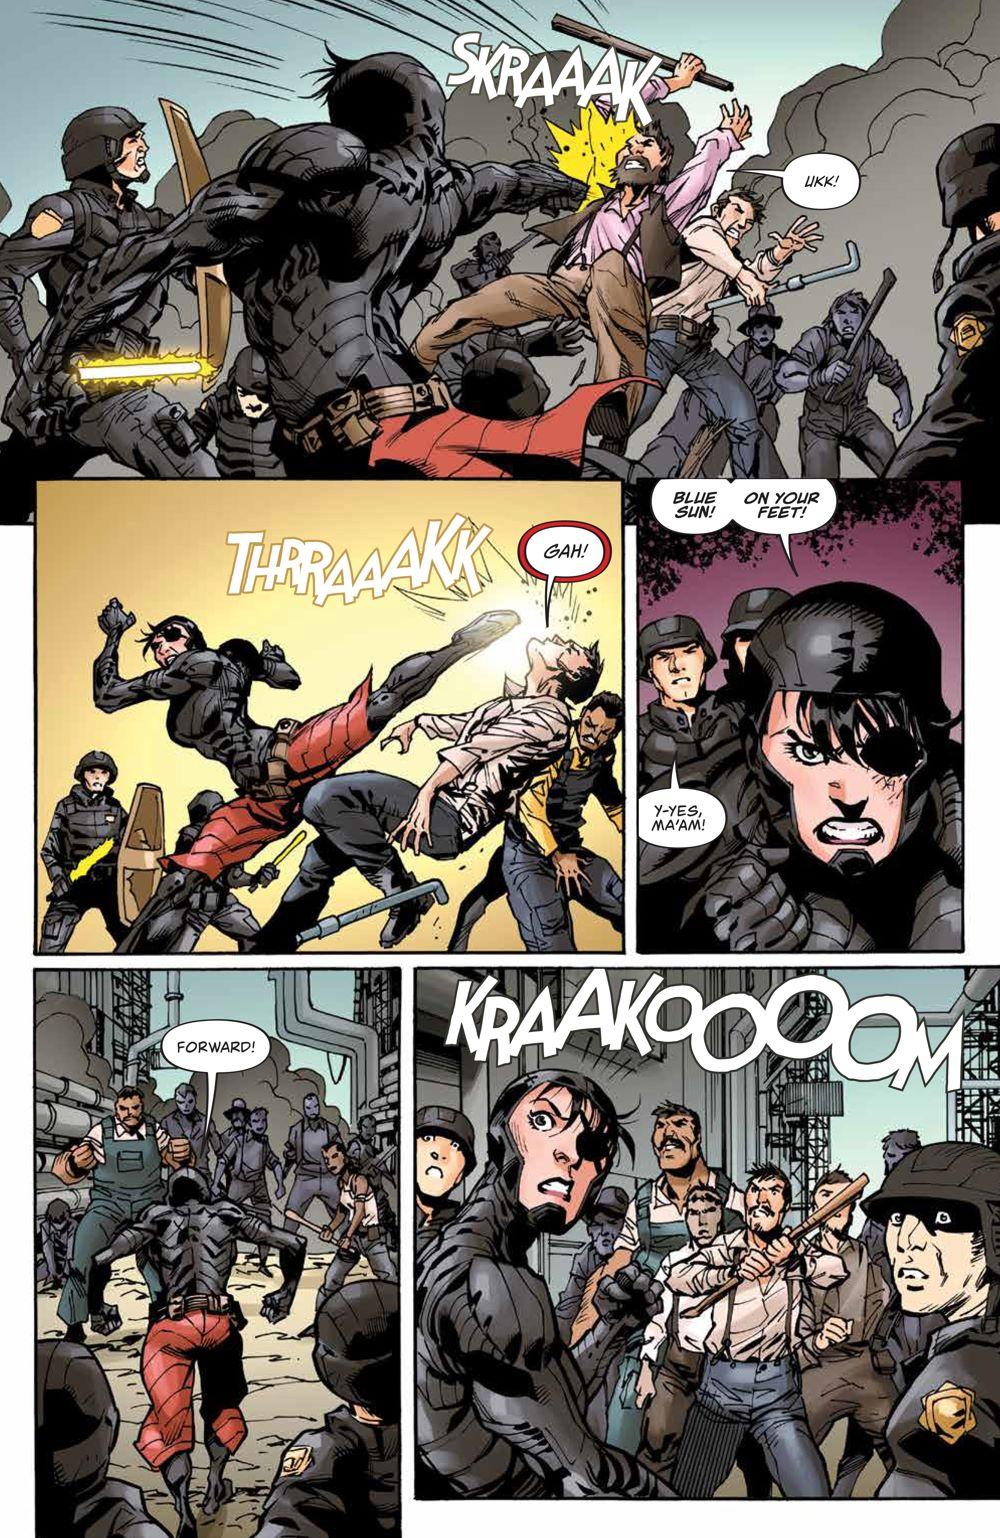 Firefly_NewSheriffVerse_v2_HC_PRESS_16 ComicList Previews: FIREFLY NEW SHERIFF IN THE 'VERSE VOLUME 2 HC